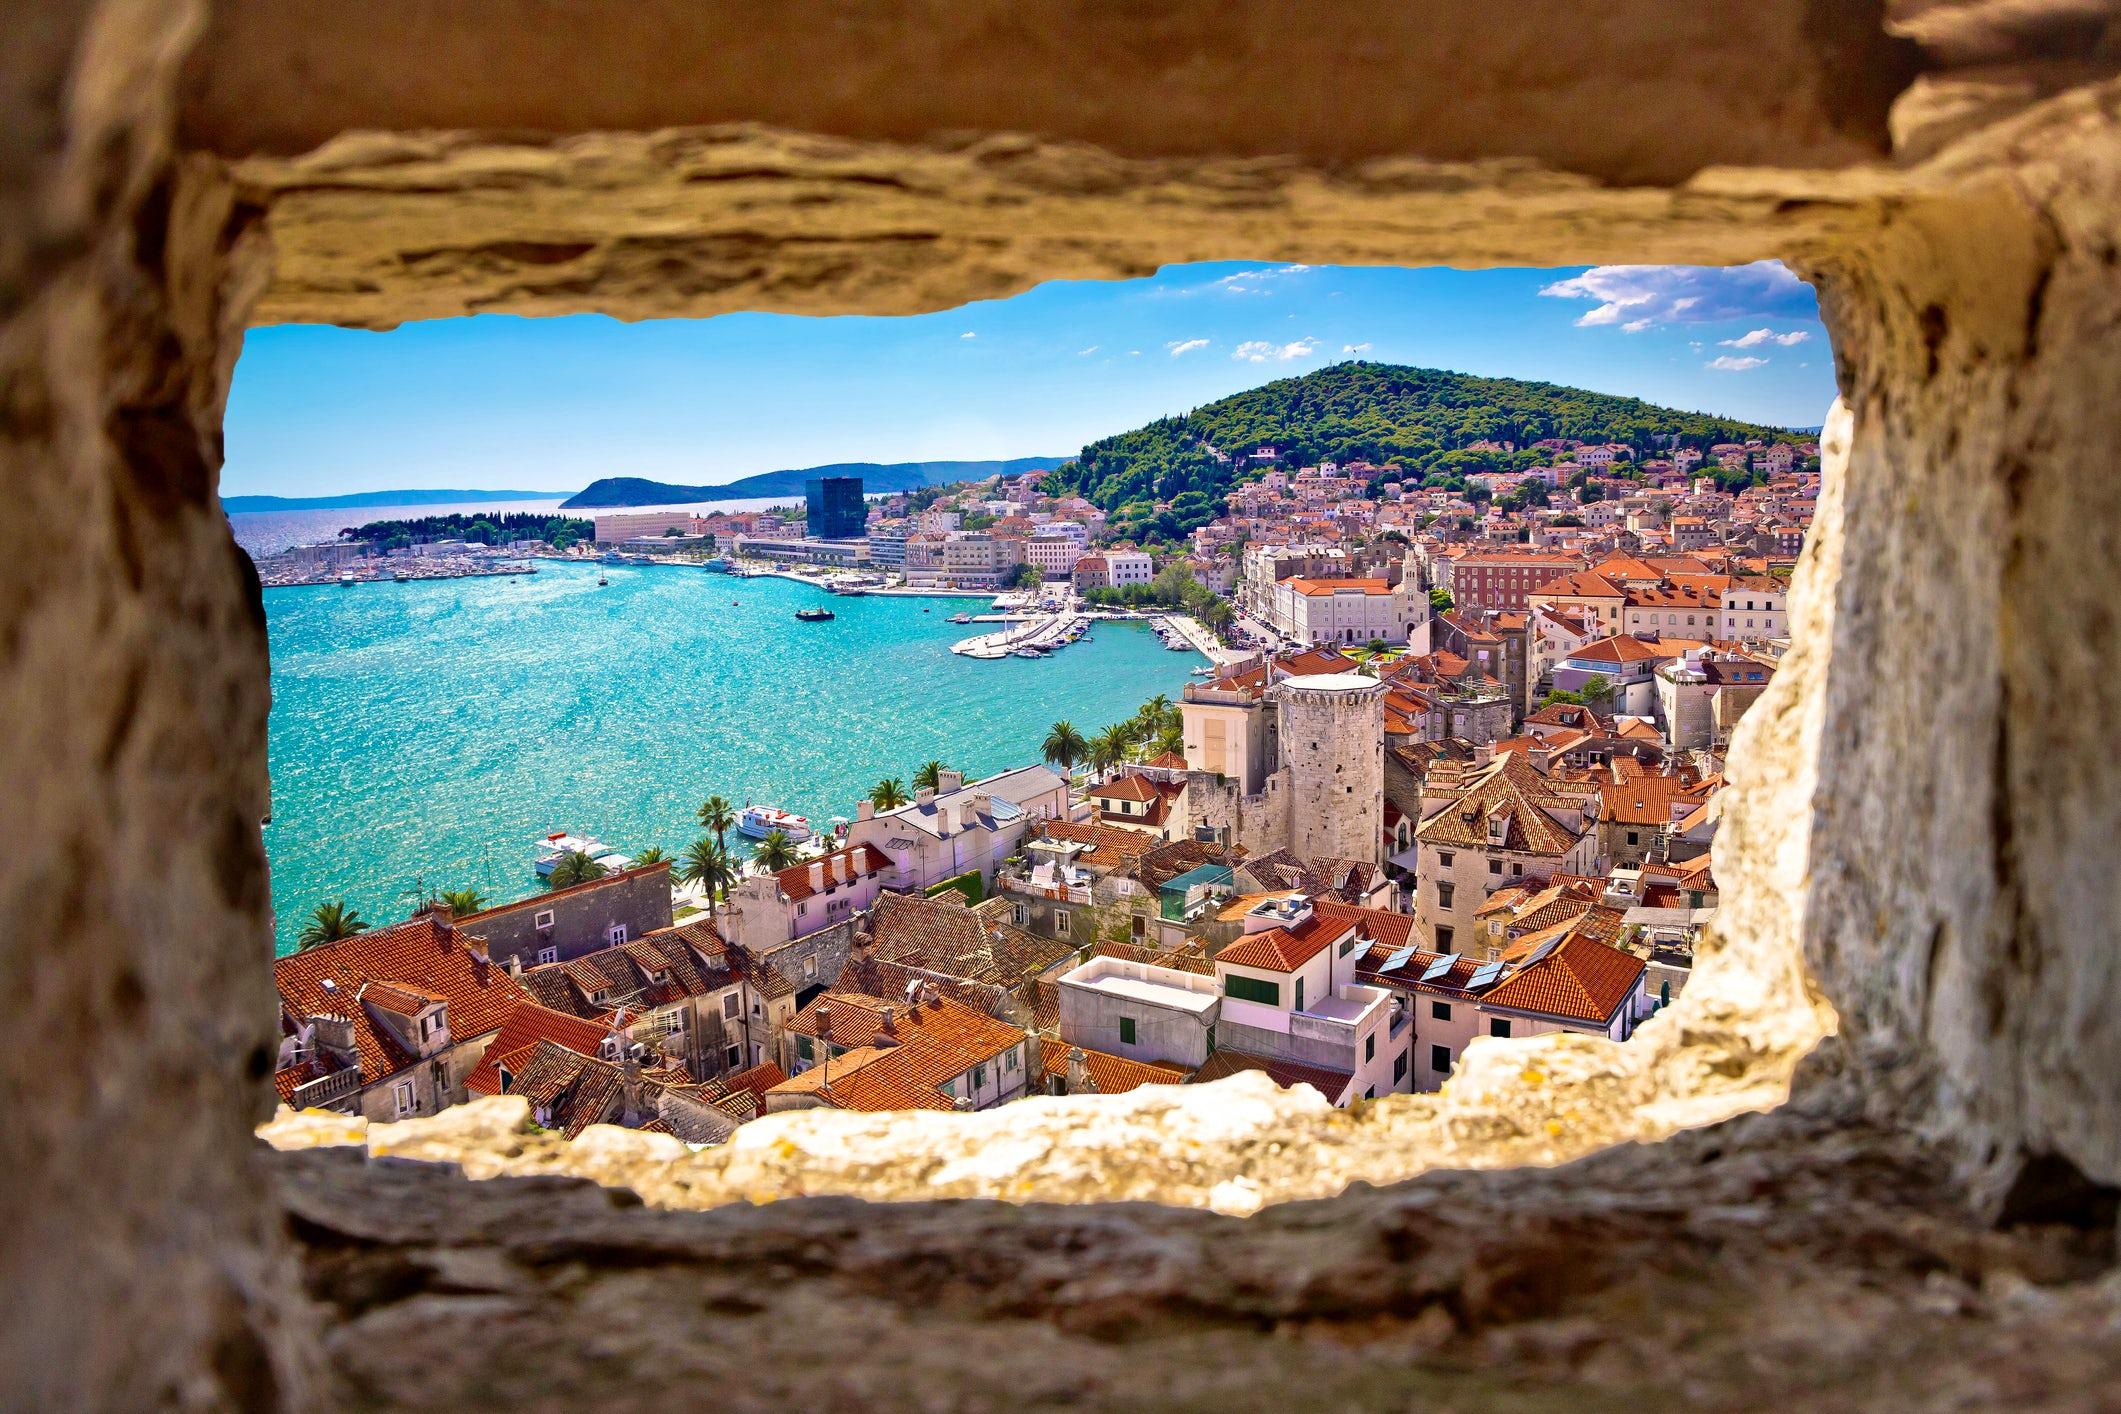 Croatian adventure begins here